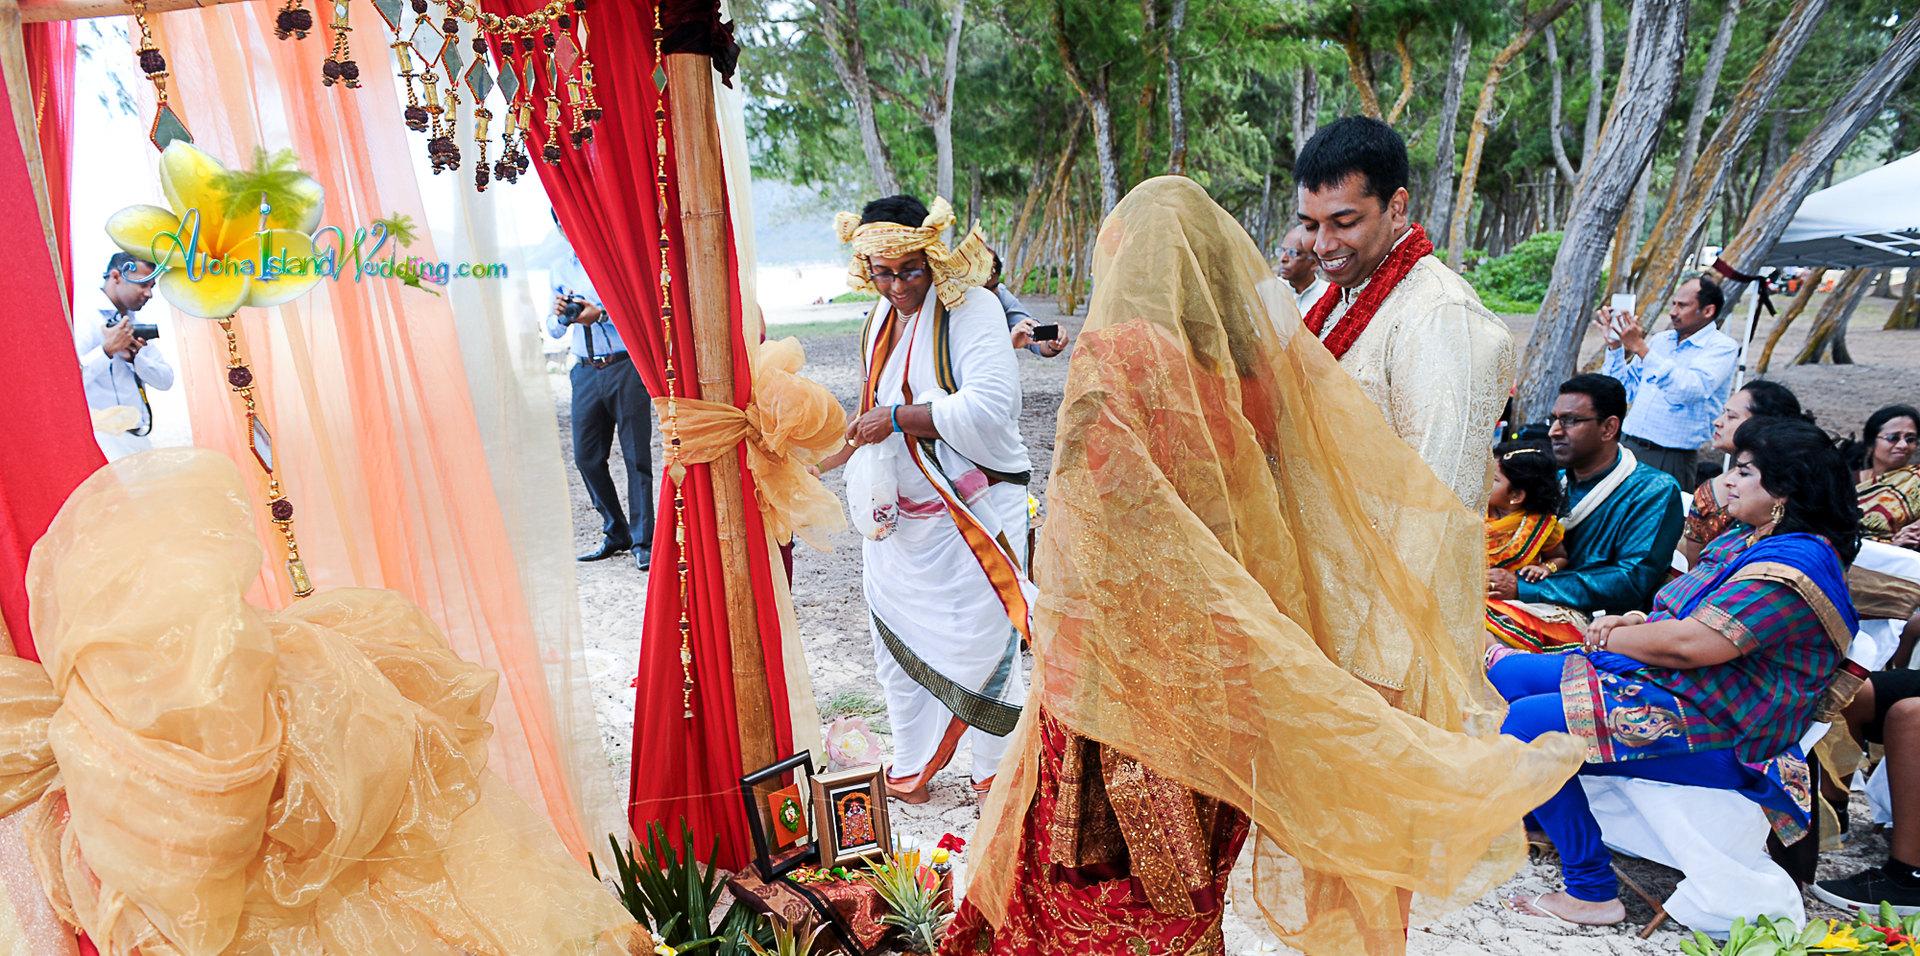 Indian wedding ceremony in hawaii-49.jpg